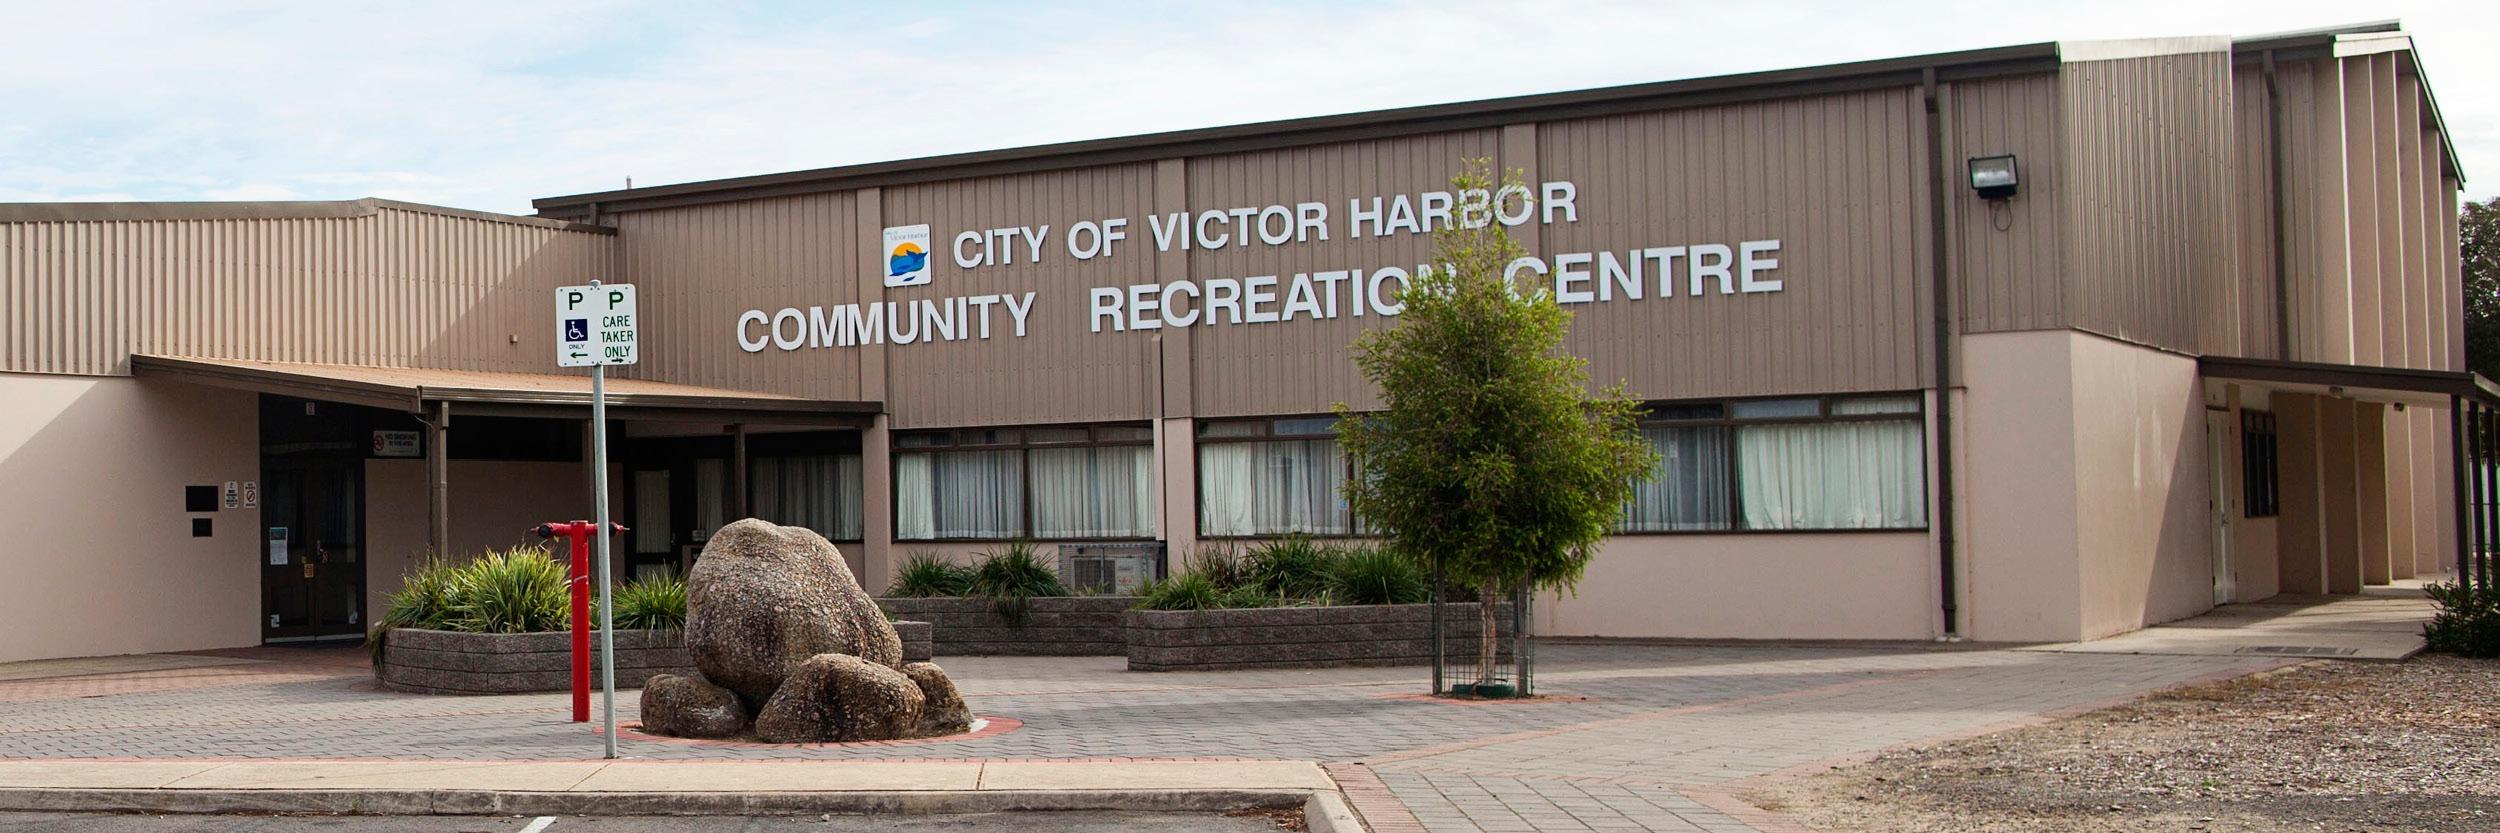 Victor Harbor Recreation Centre - Home of Victor Harbor BJJ